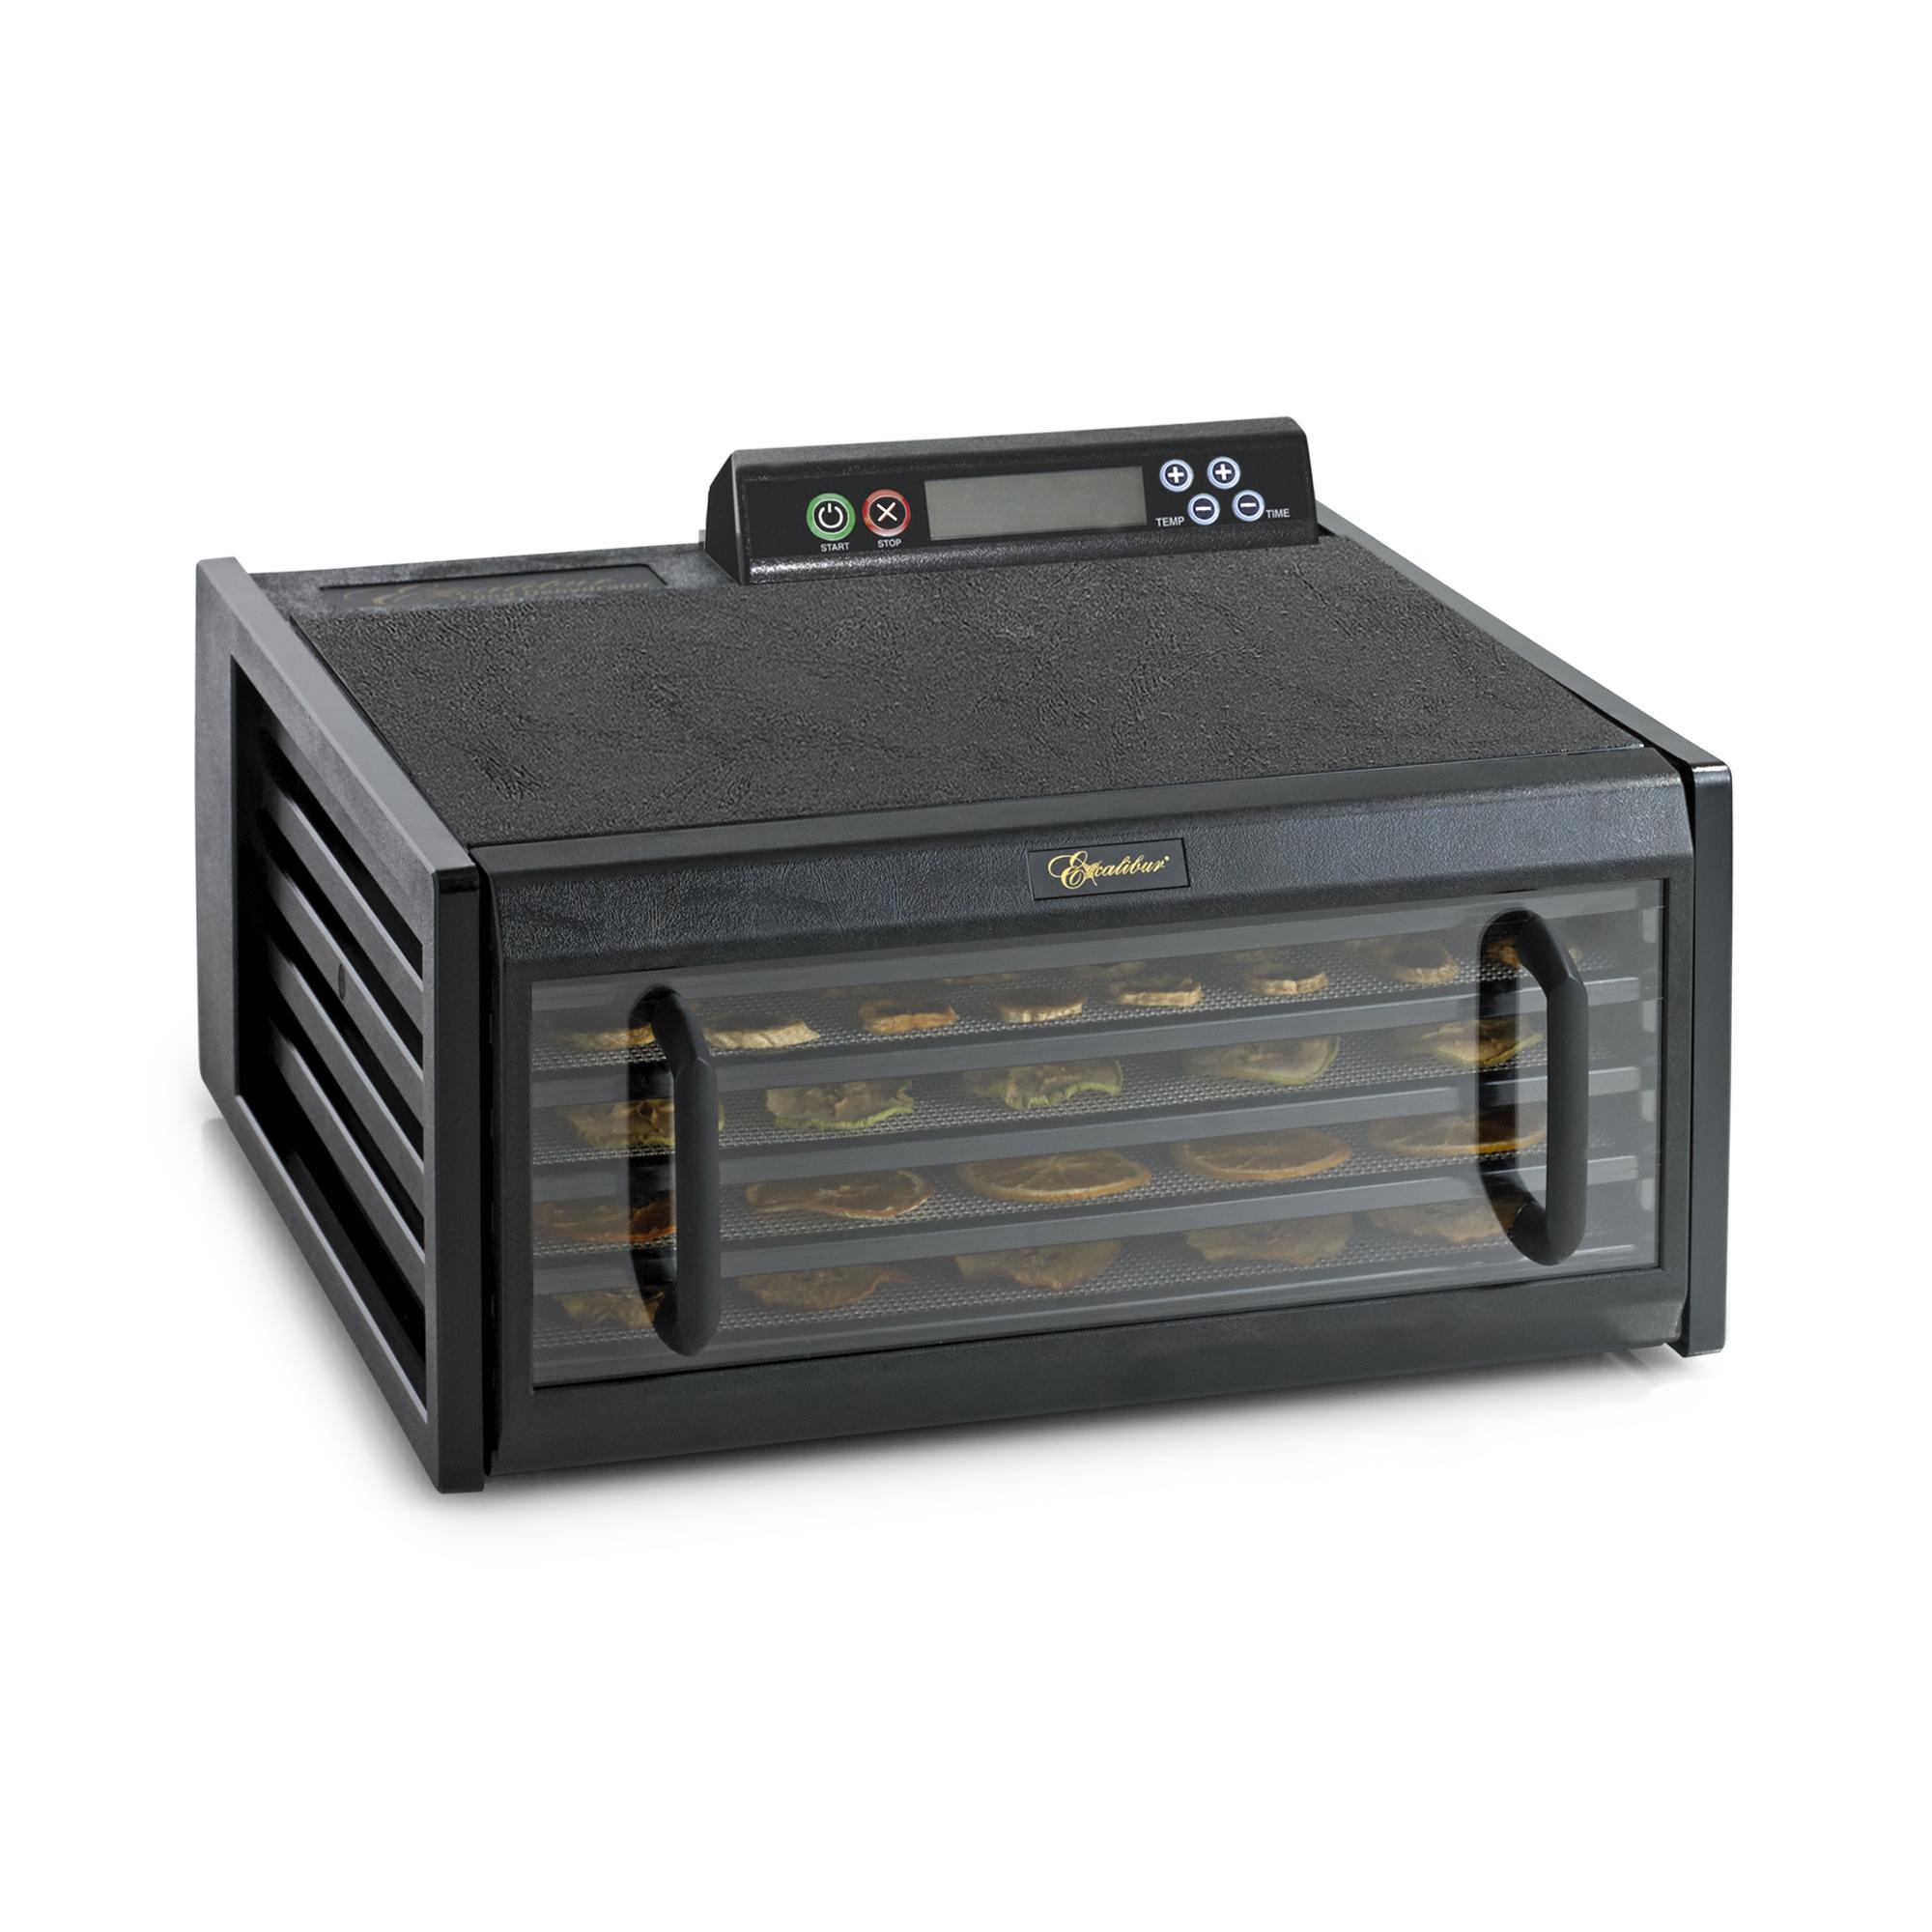 Excalibur 4548CDBF Voedseldroger-Droogoven-5 lades-LCD display-Glazen deur